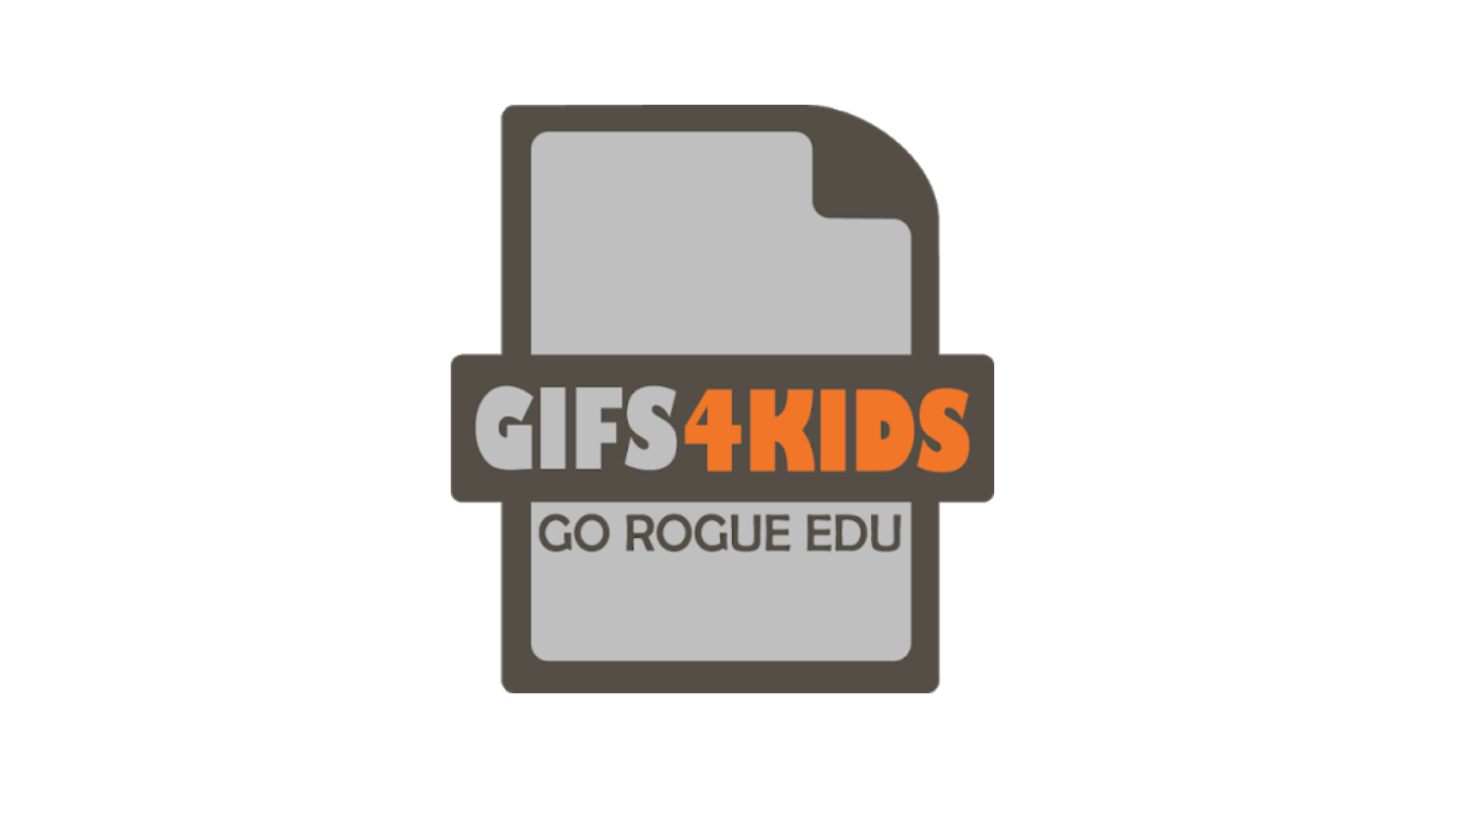 GIFs4Kids